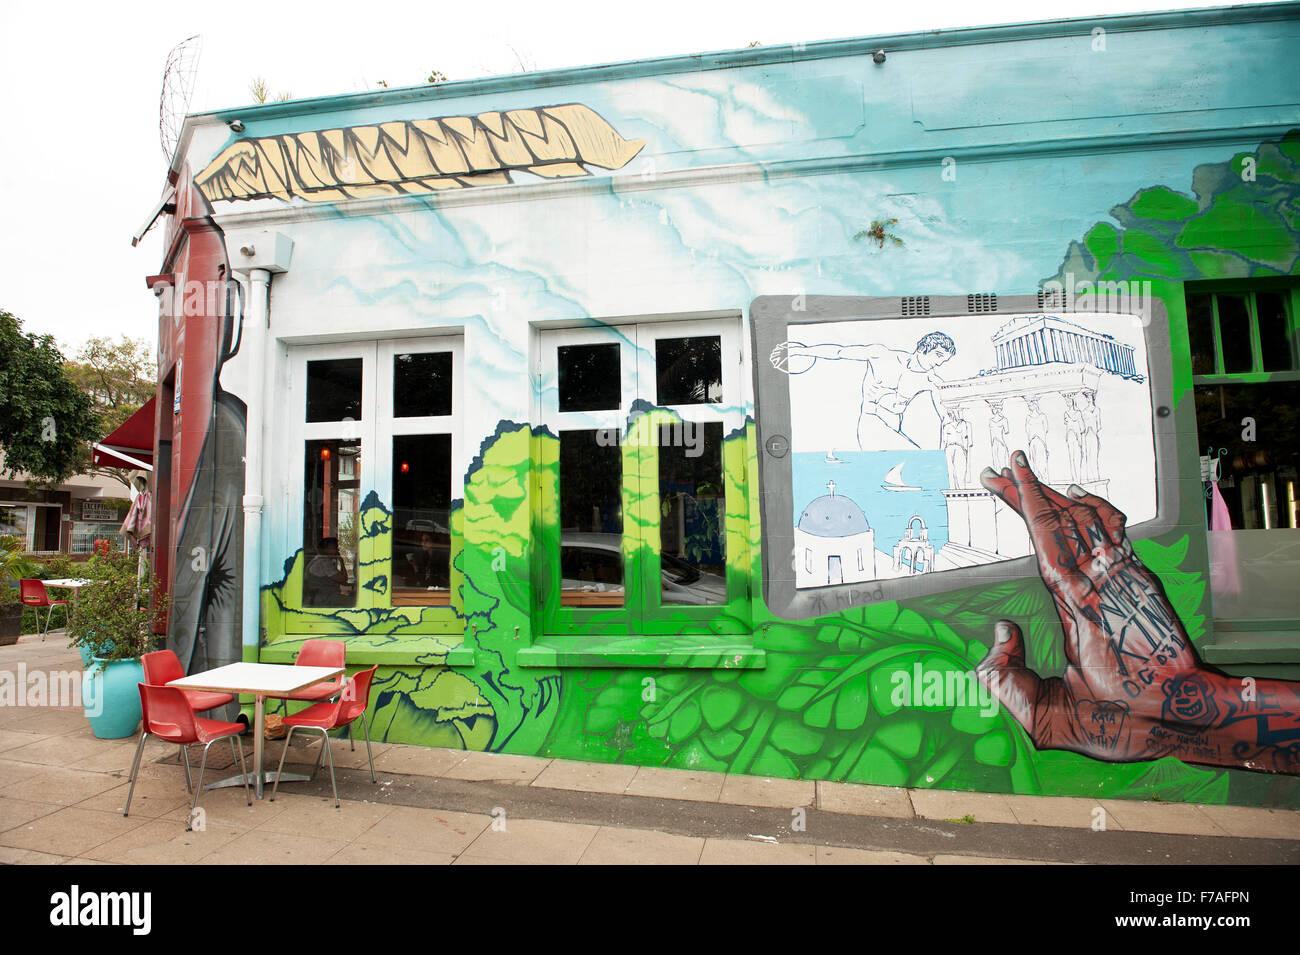 Sidewalk cafe in the Glenwood suburb of Durban South Africa.  Trendy restaurant in the Morningside neighbourhood - Stock Image